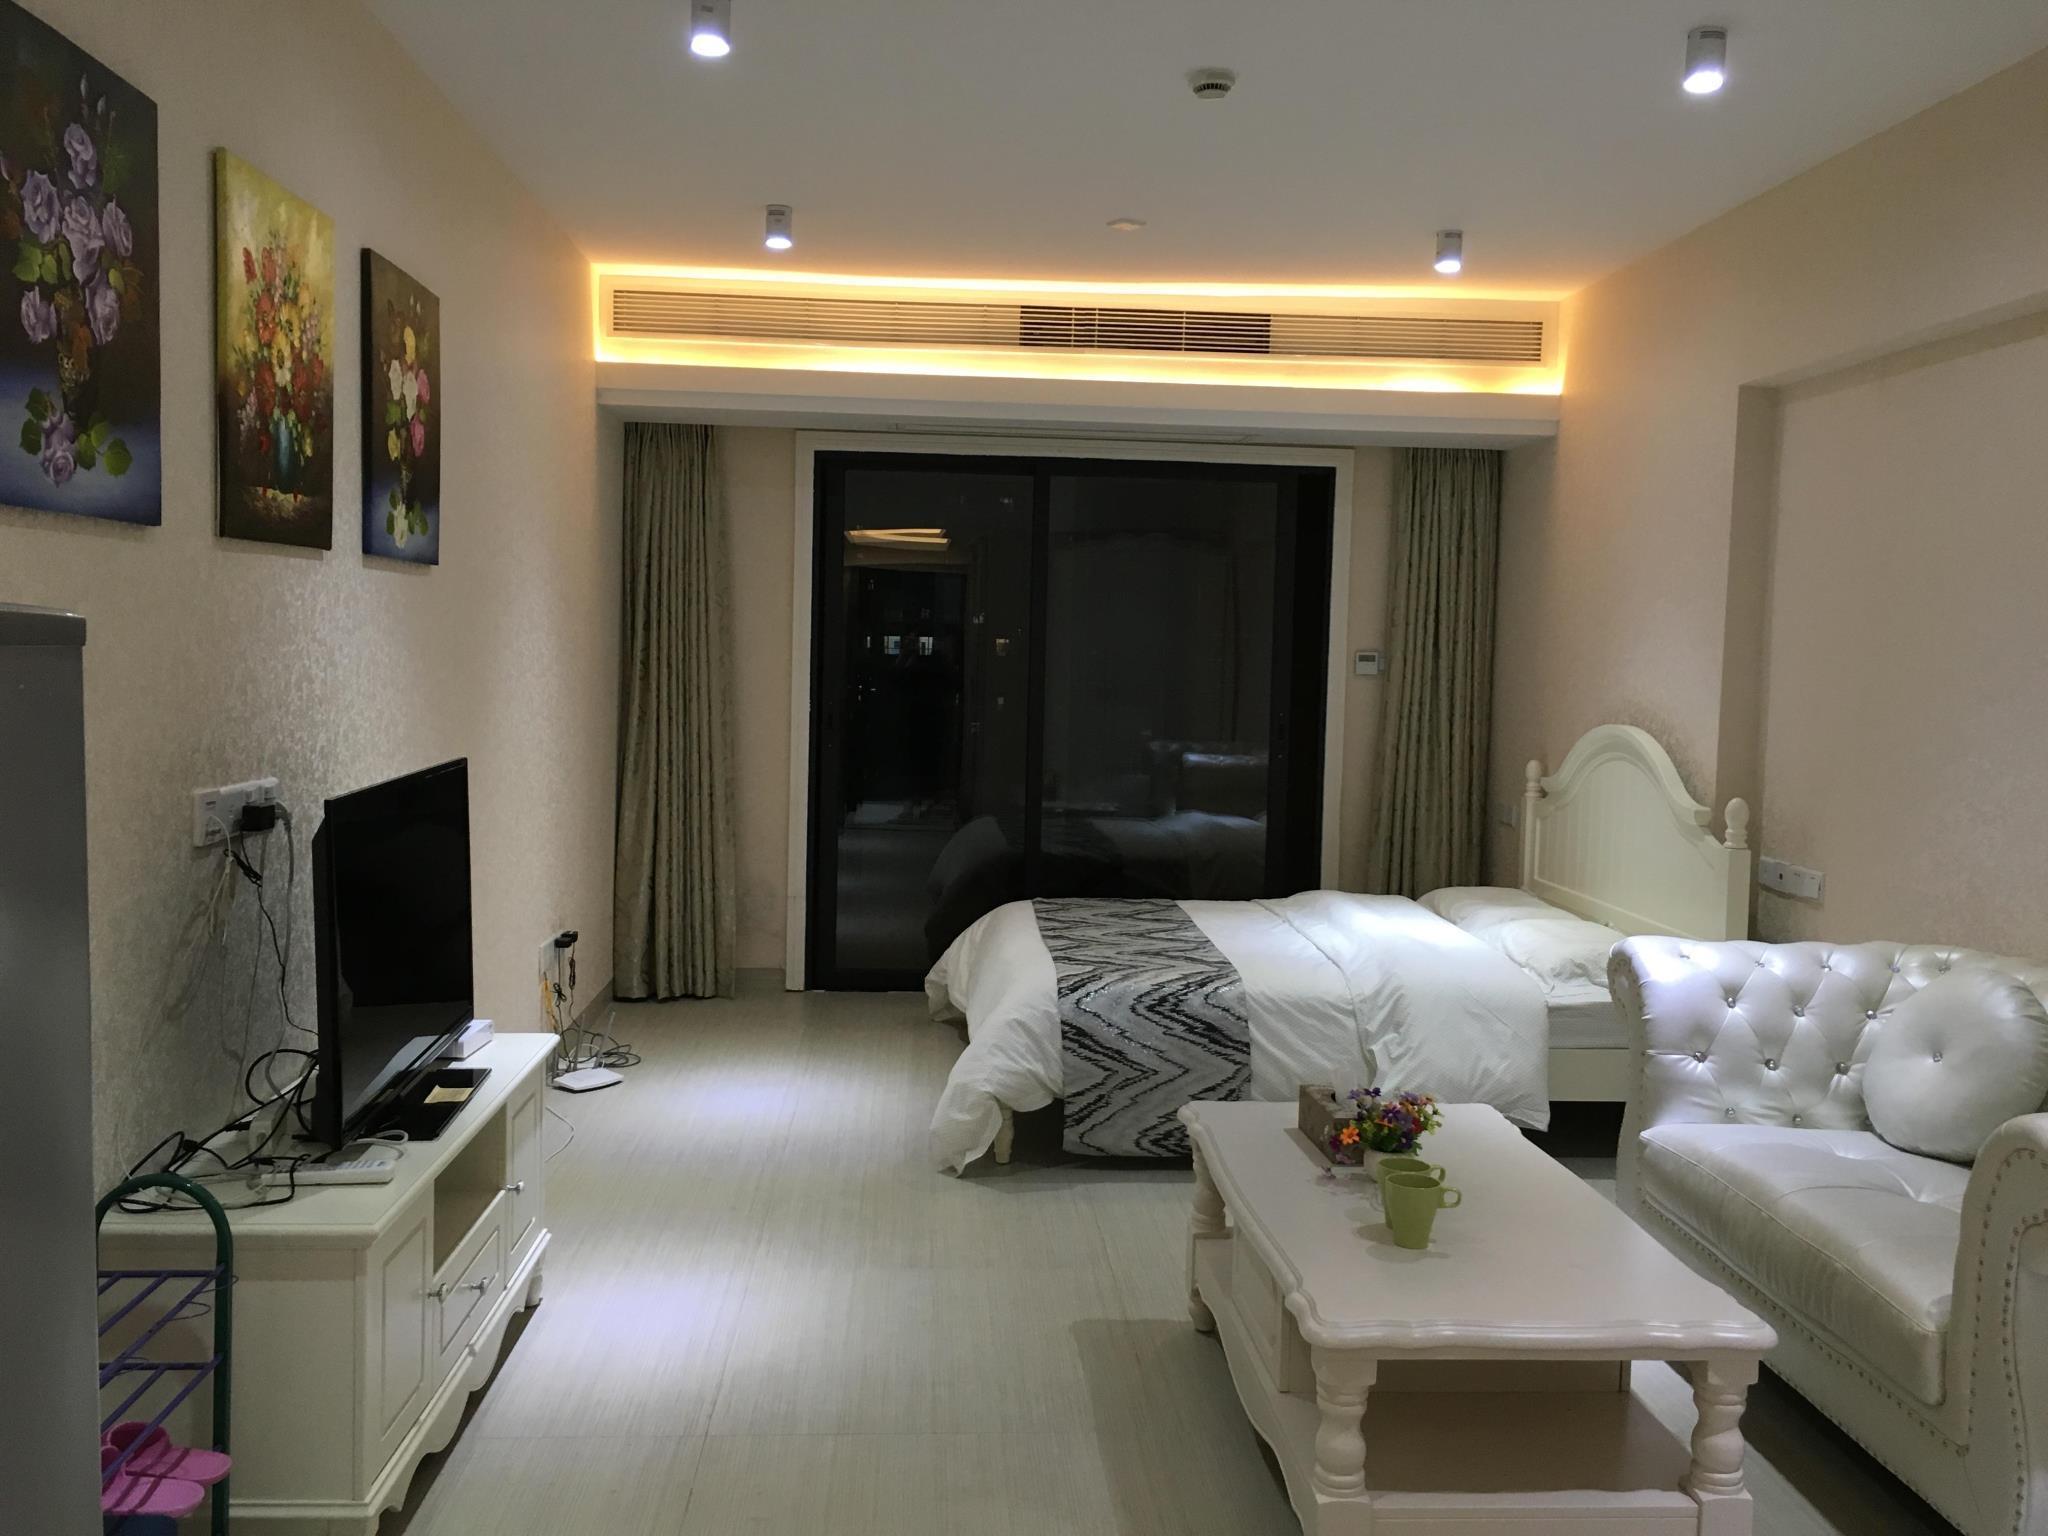 MILAN HOLIDAY Warm 1 Bed Apartment